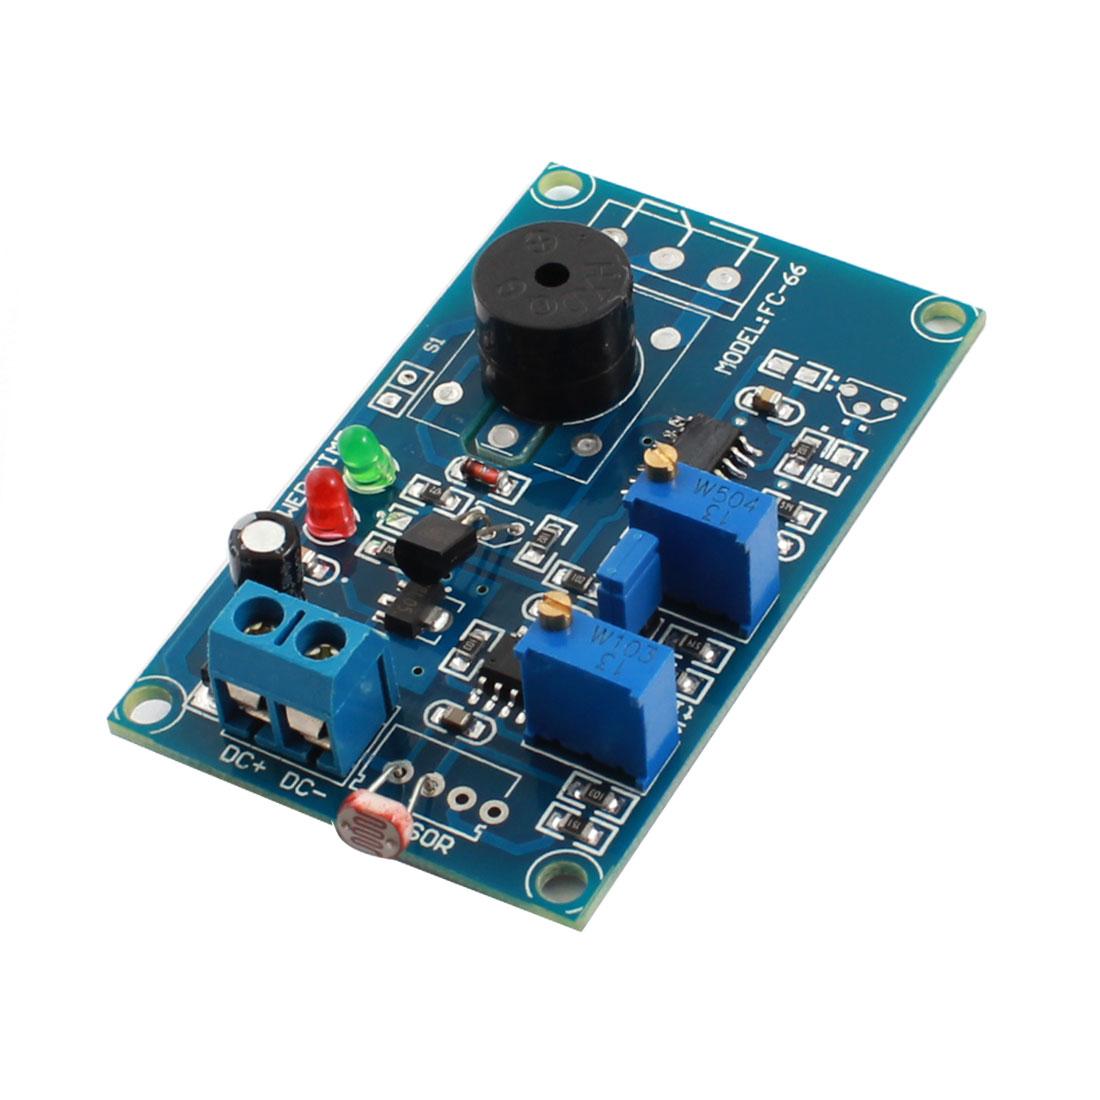 DC12V 2-LED Lamp 20s Light Trigger Photovaristor Time Delay Alarm Buzzer PCB Board Module